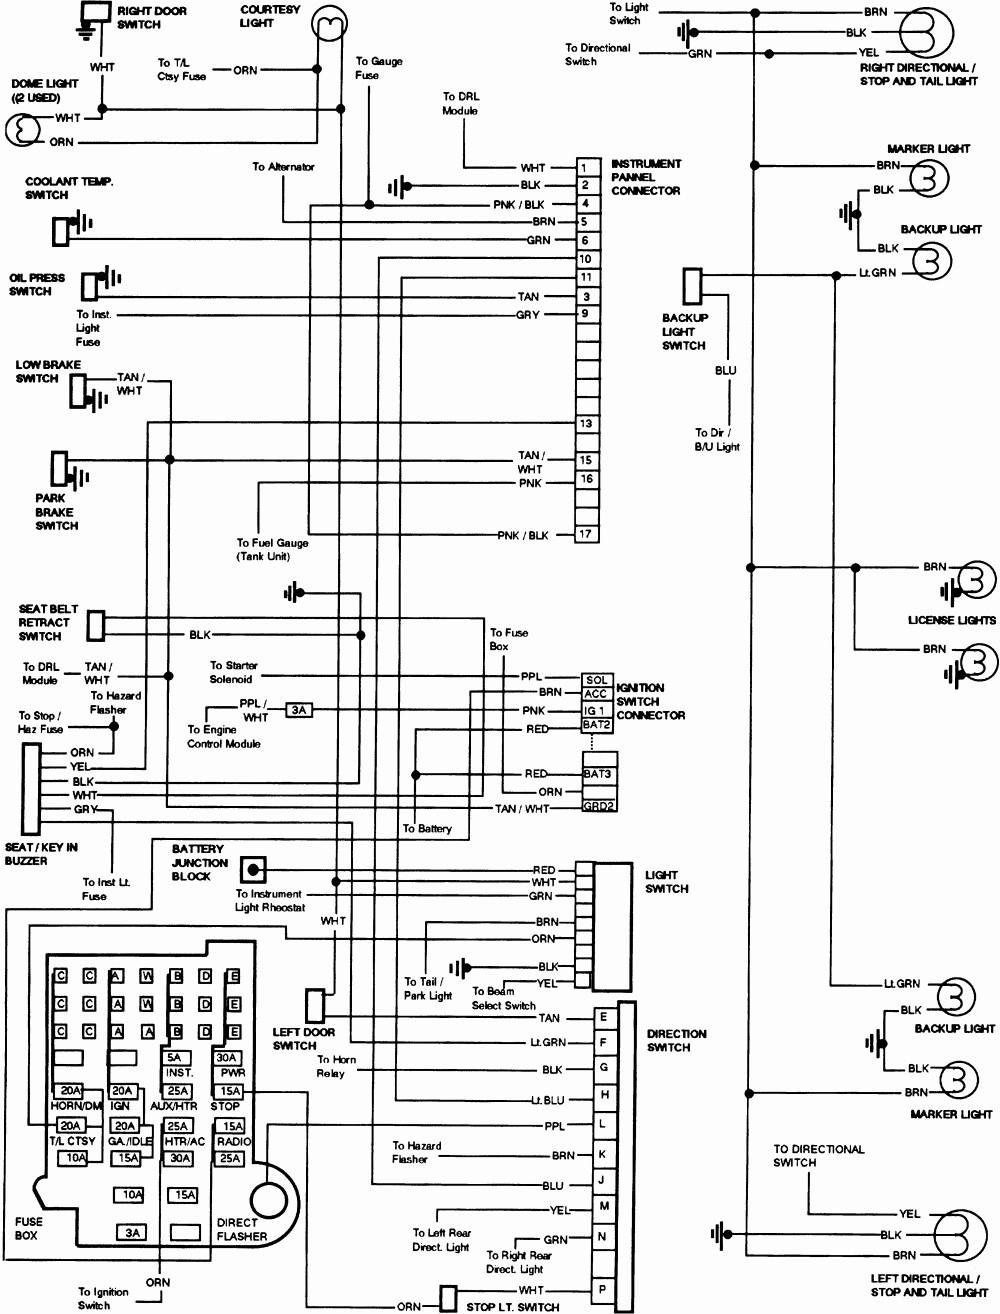 Gmc Truck Wiring Diagrams Switch Diagram 1970 Mercedes Benz Fuse Box 86 U2022 Rh Friendsoffido Co 1951 Free